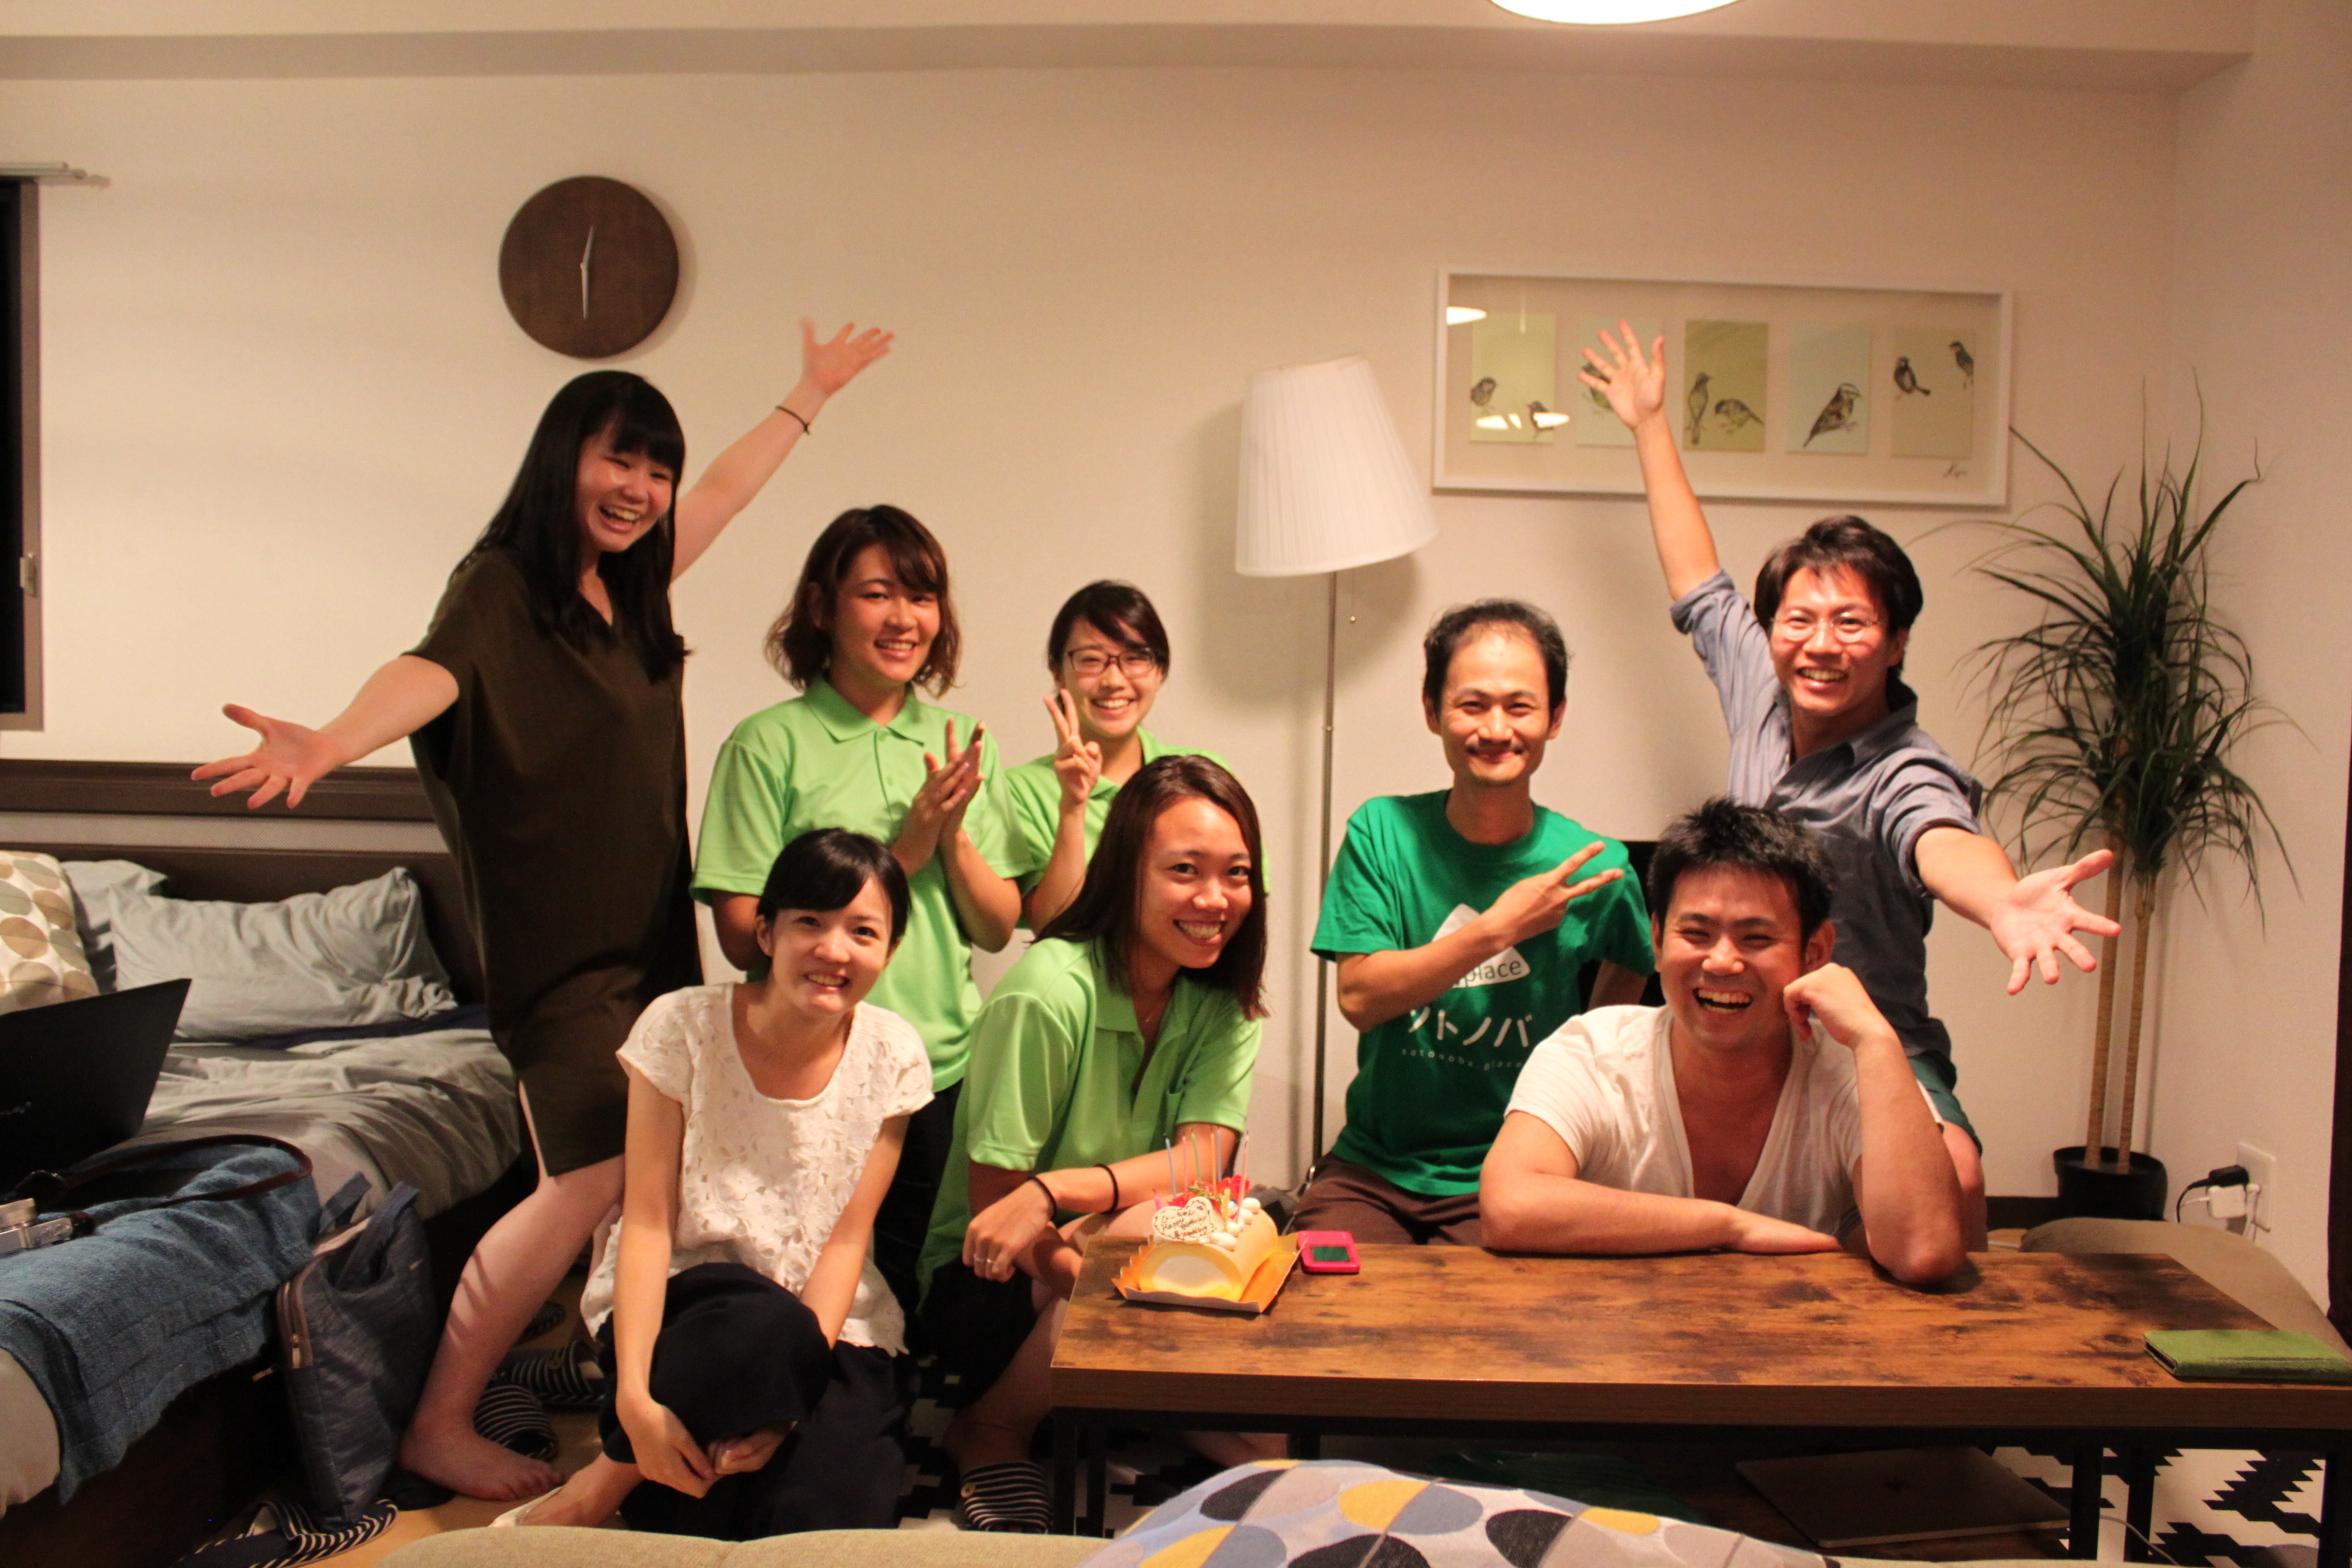 Photo by Tsubasa Endo